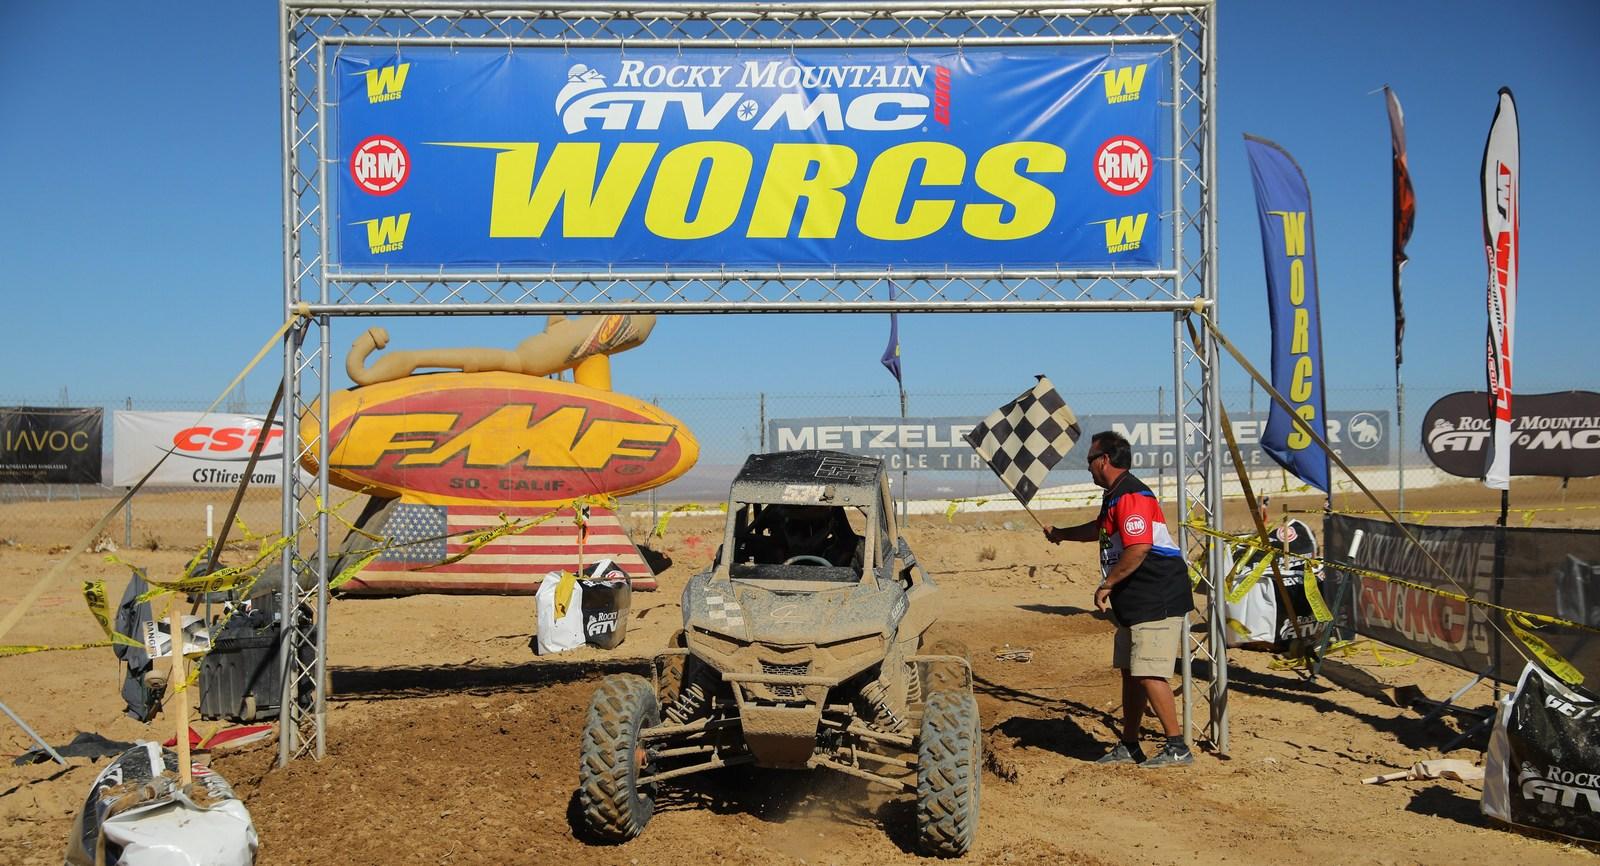 09-corbin-leaverton-win-sxs-pro-worcs-racing